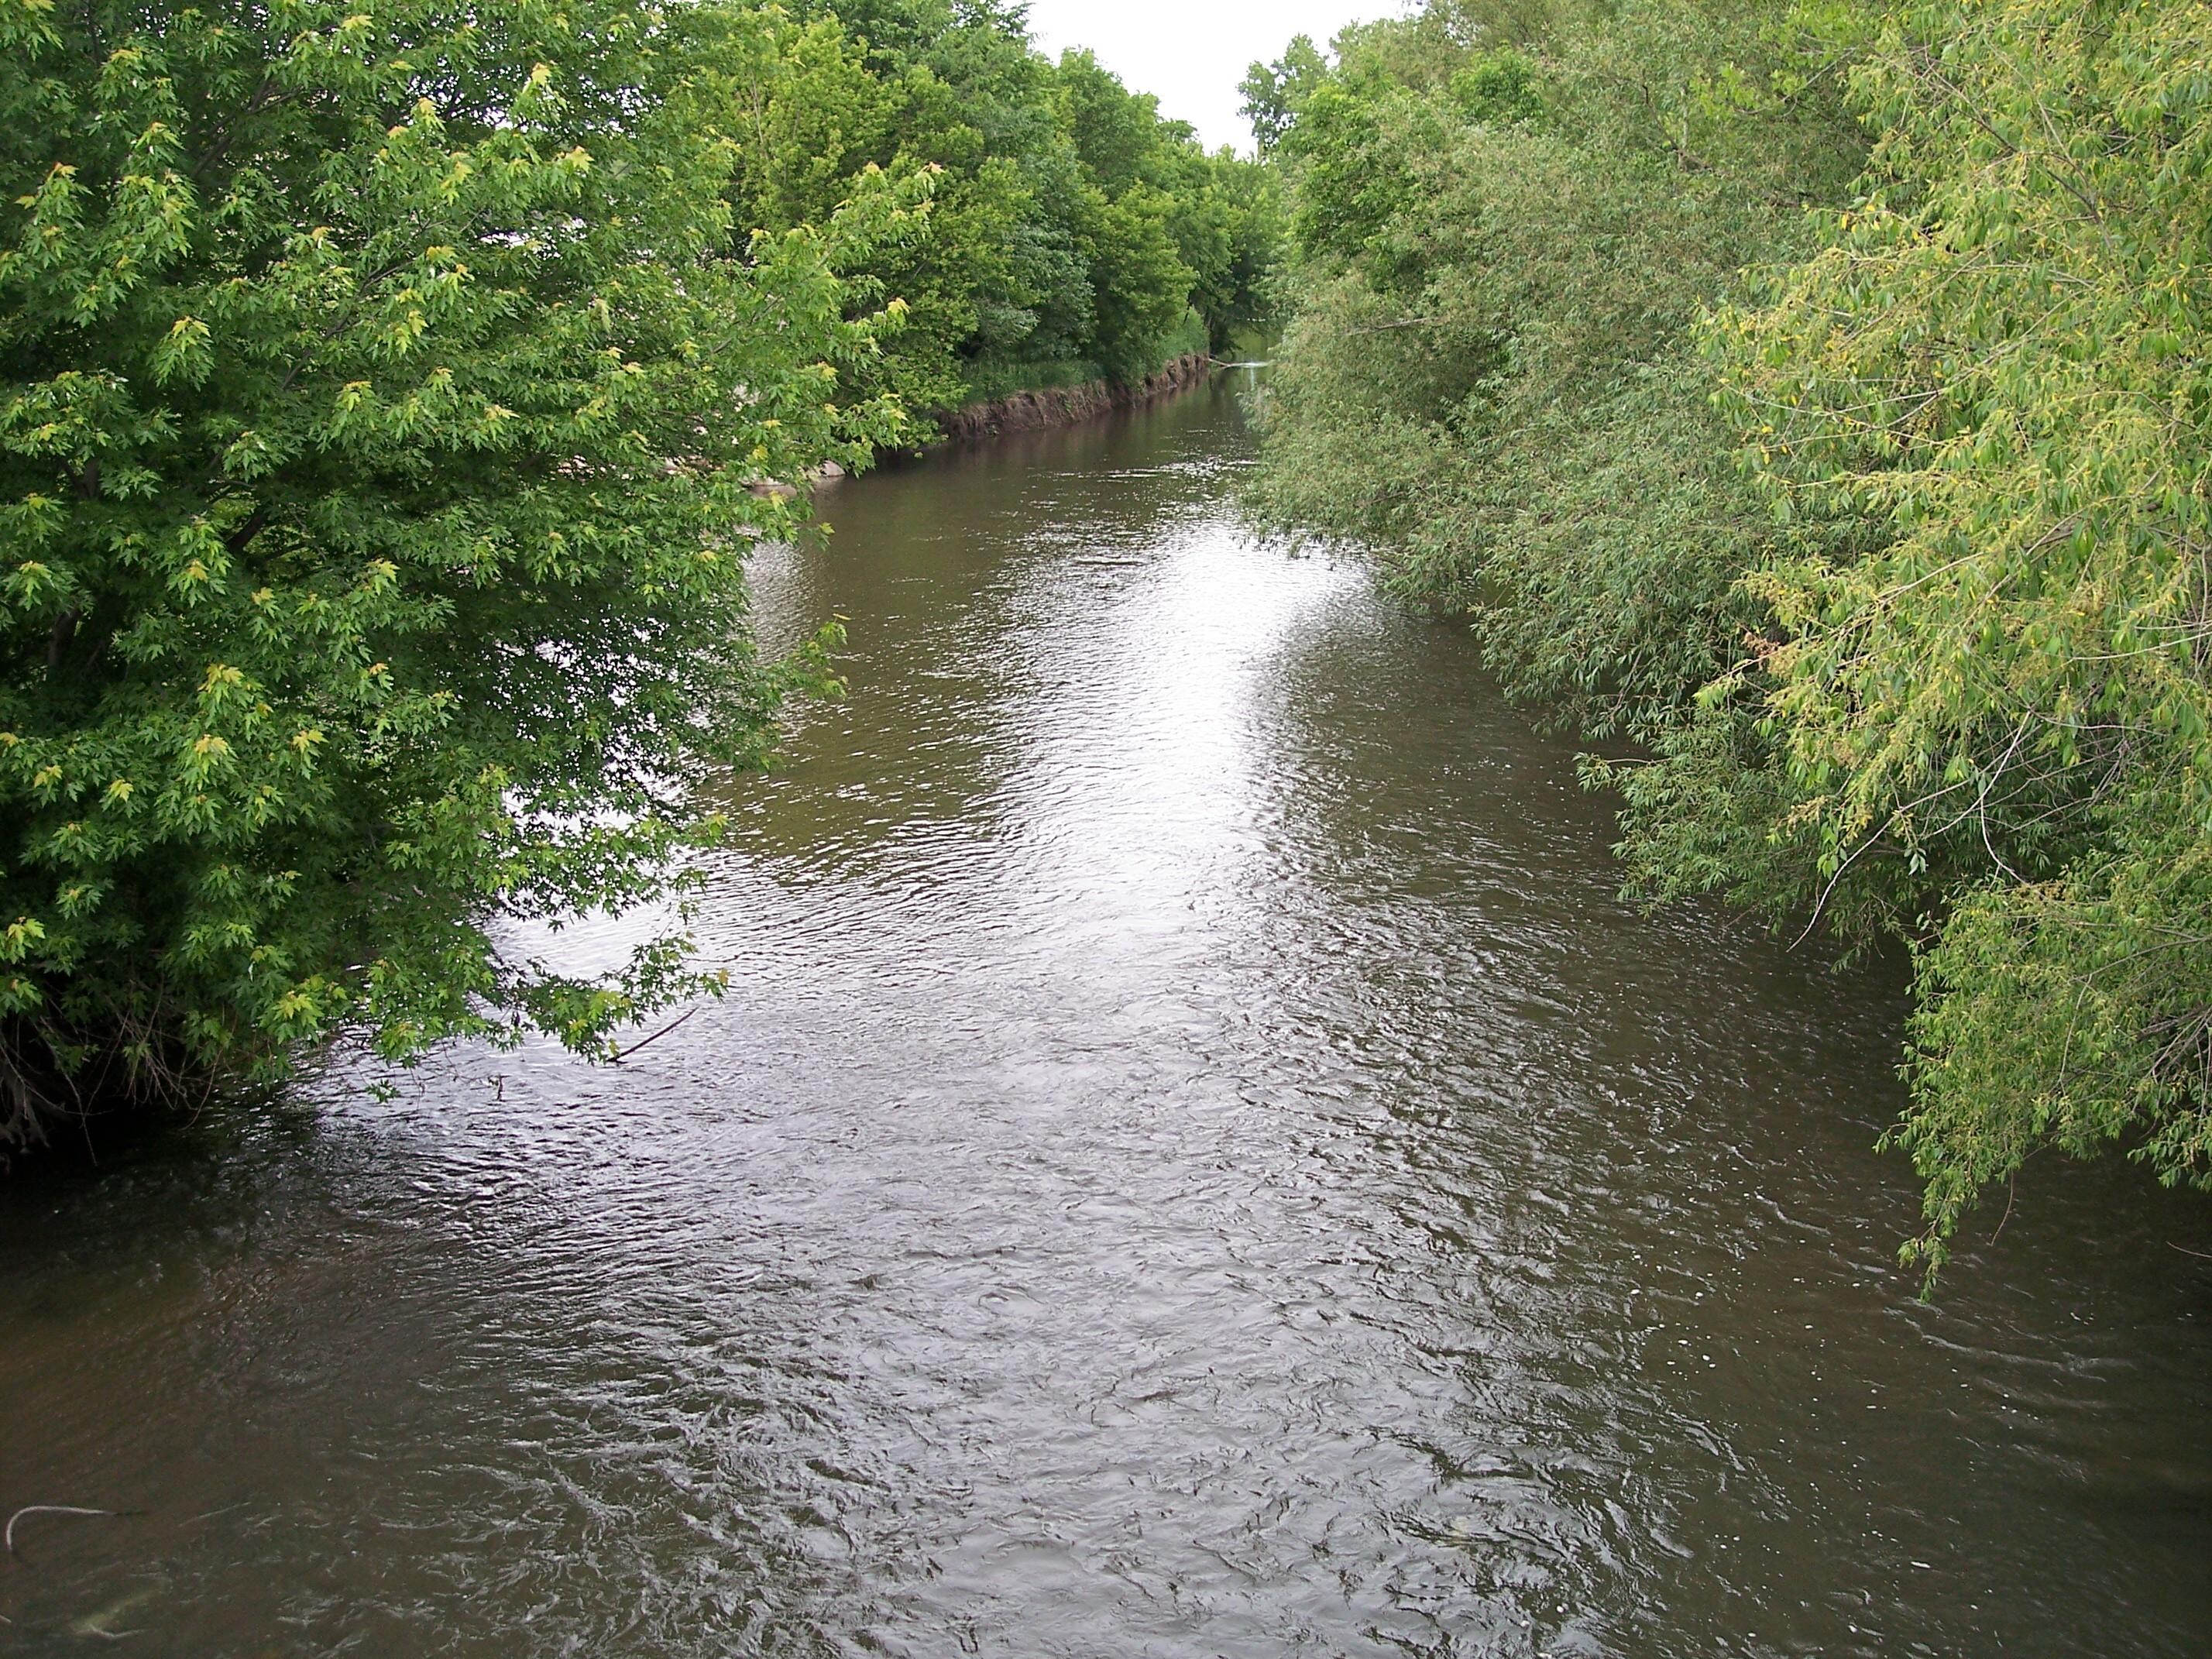 filestraight river owatonnajpg wikimedia commons